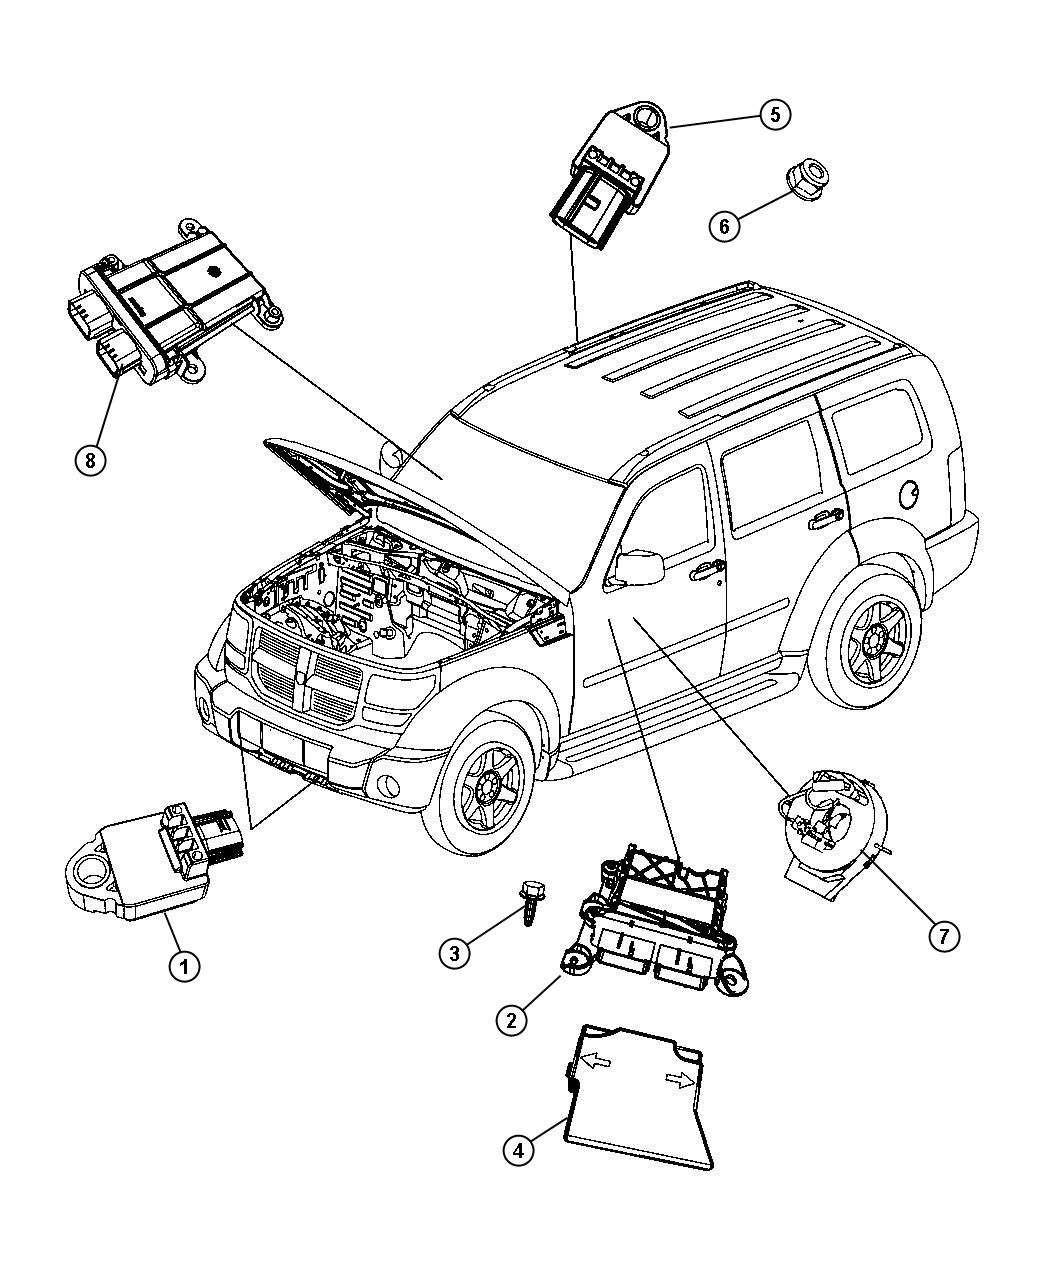 Jeep Liberty Module Occupant Restraint Air Bags